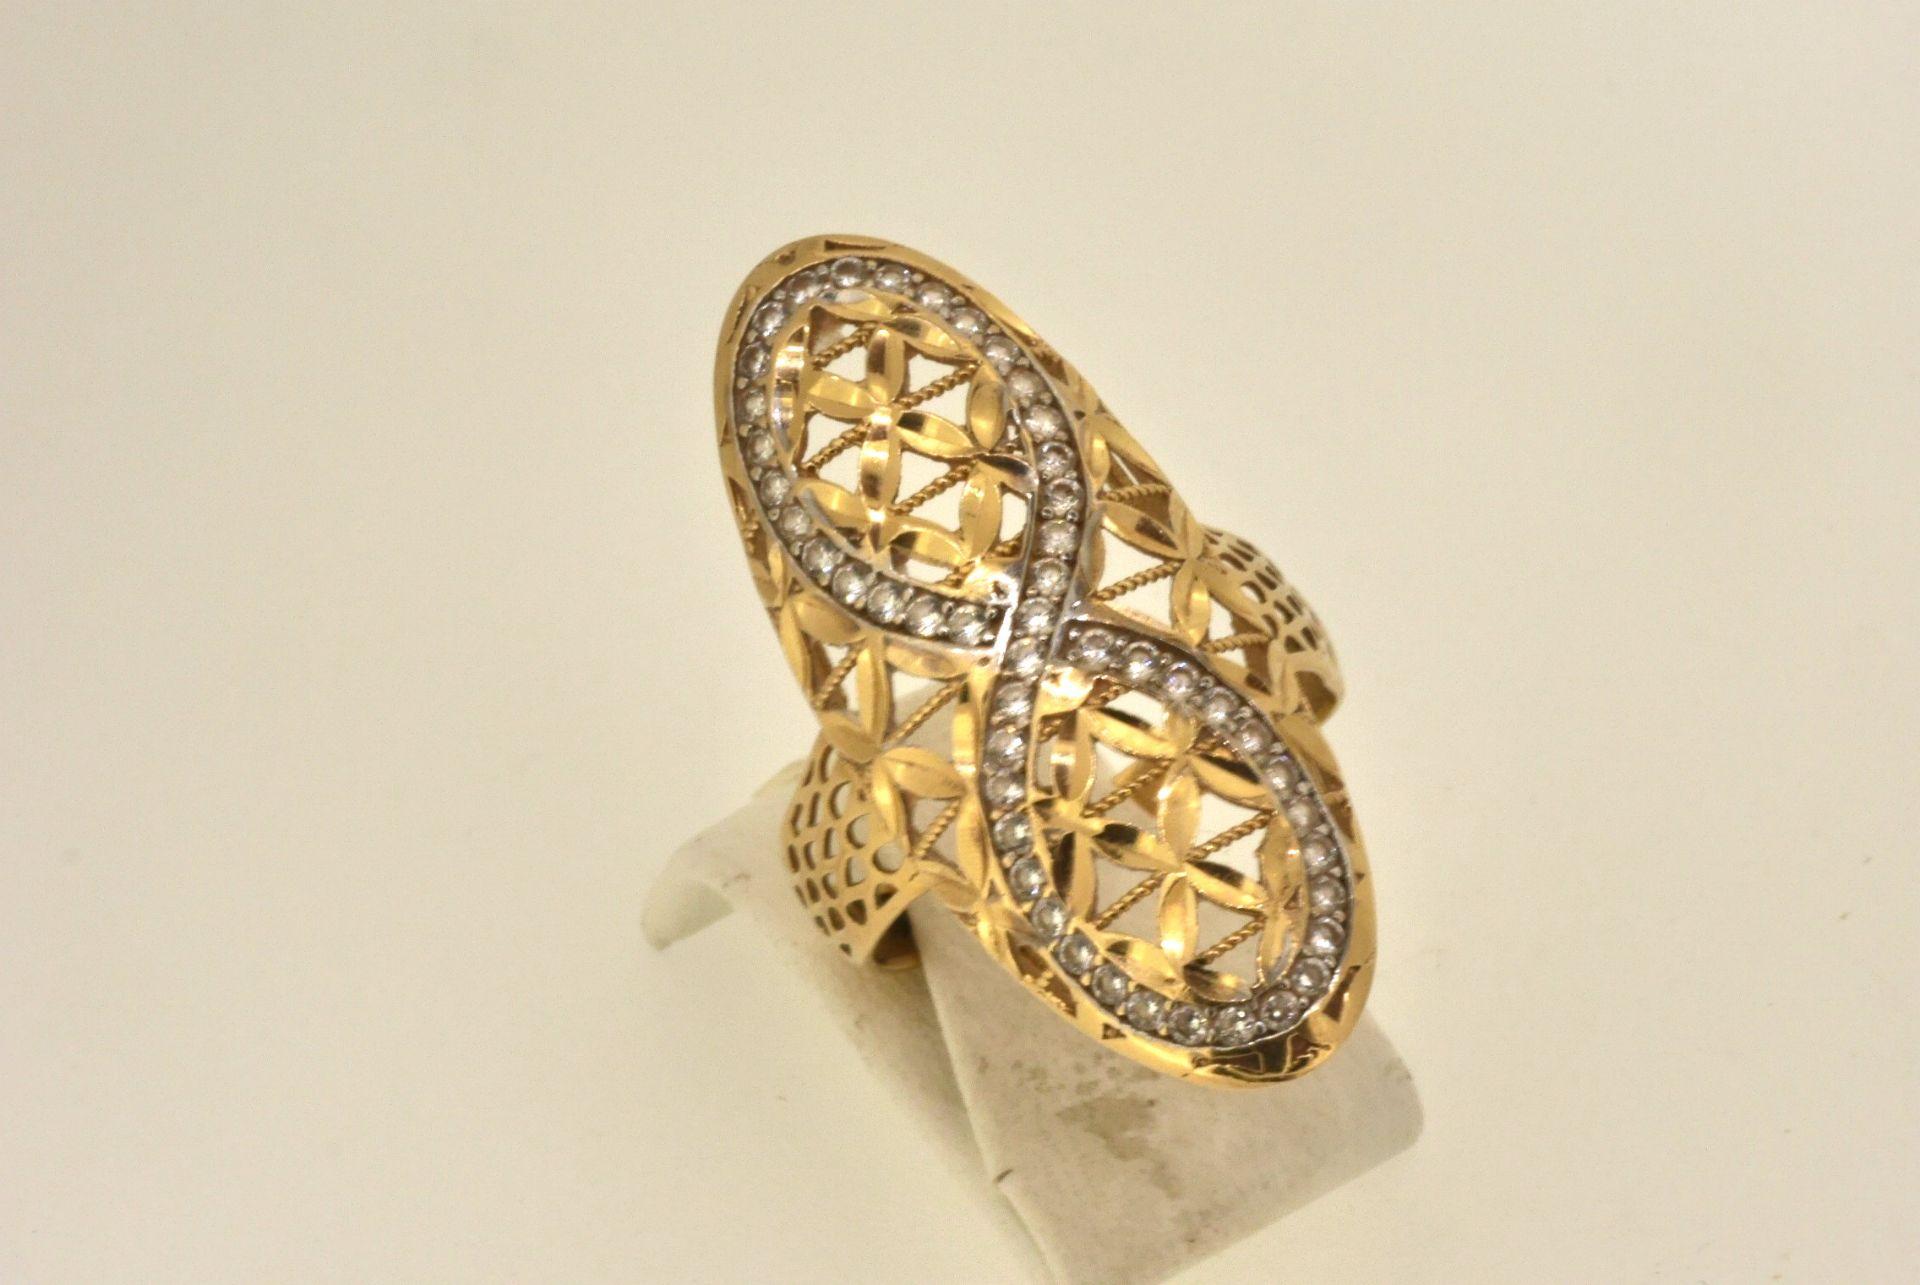 Ring WG/GG 585, Zirkonia, 4,63 Gramm